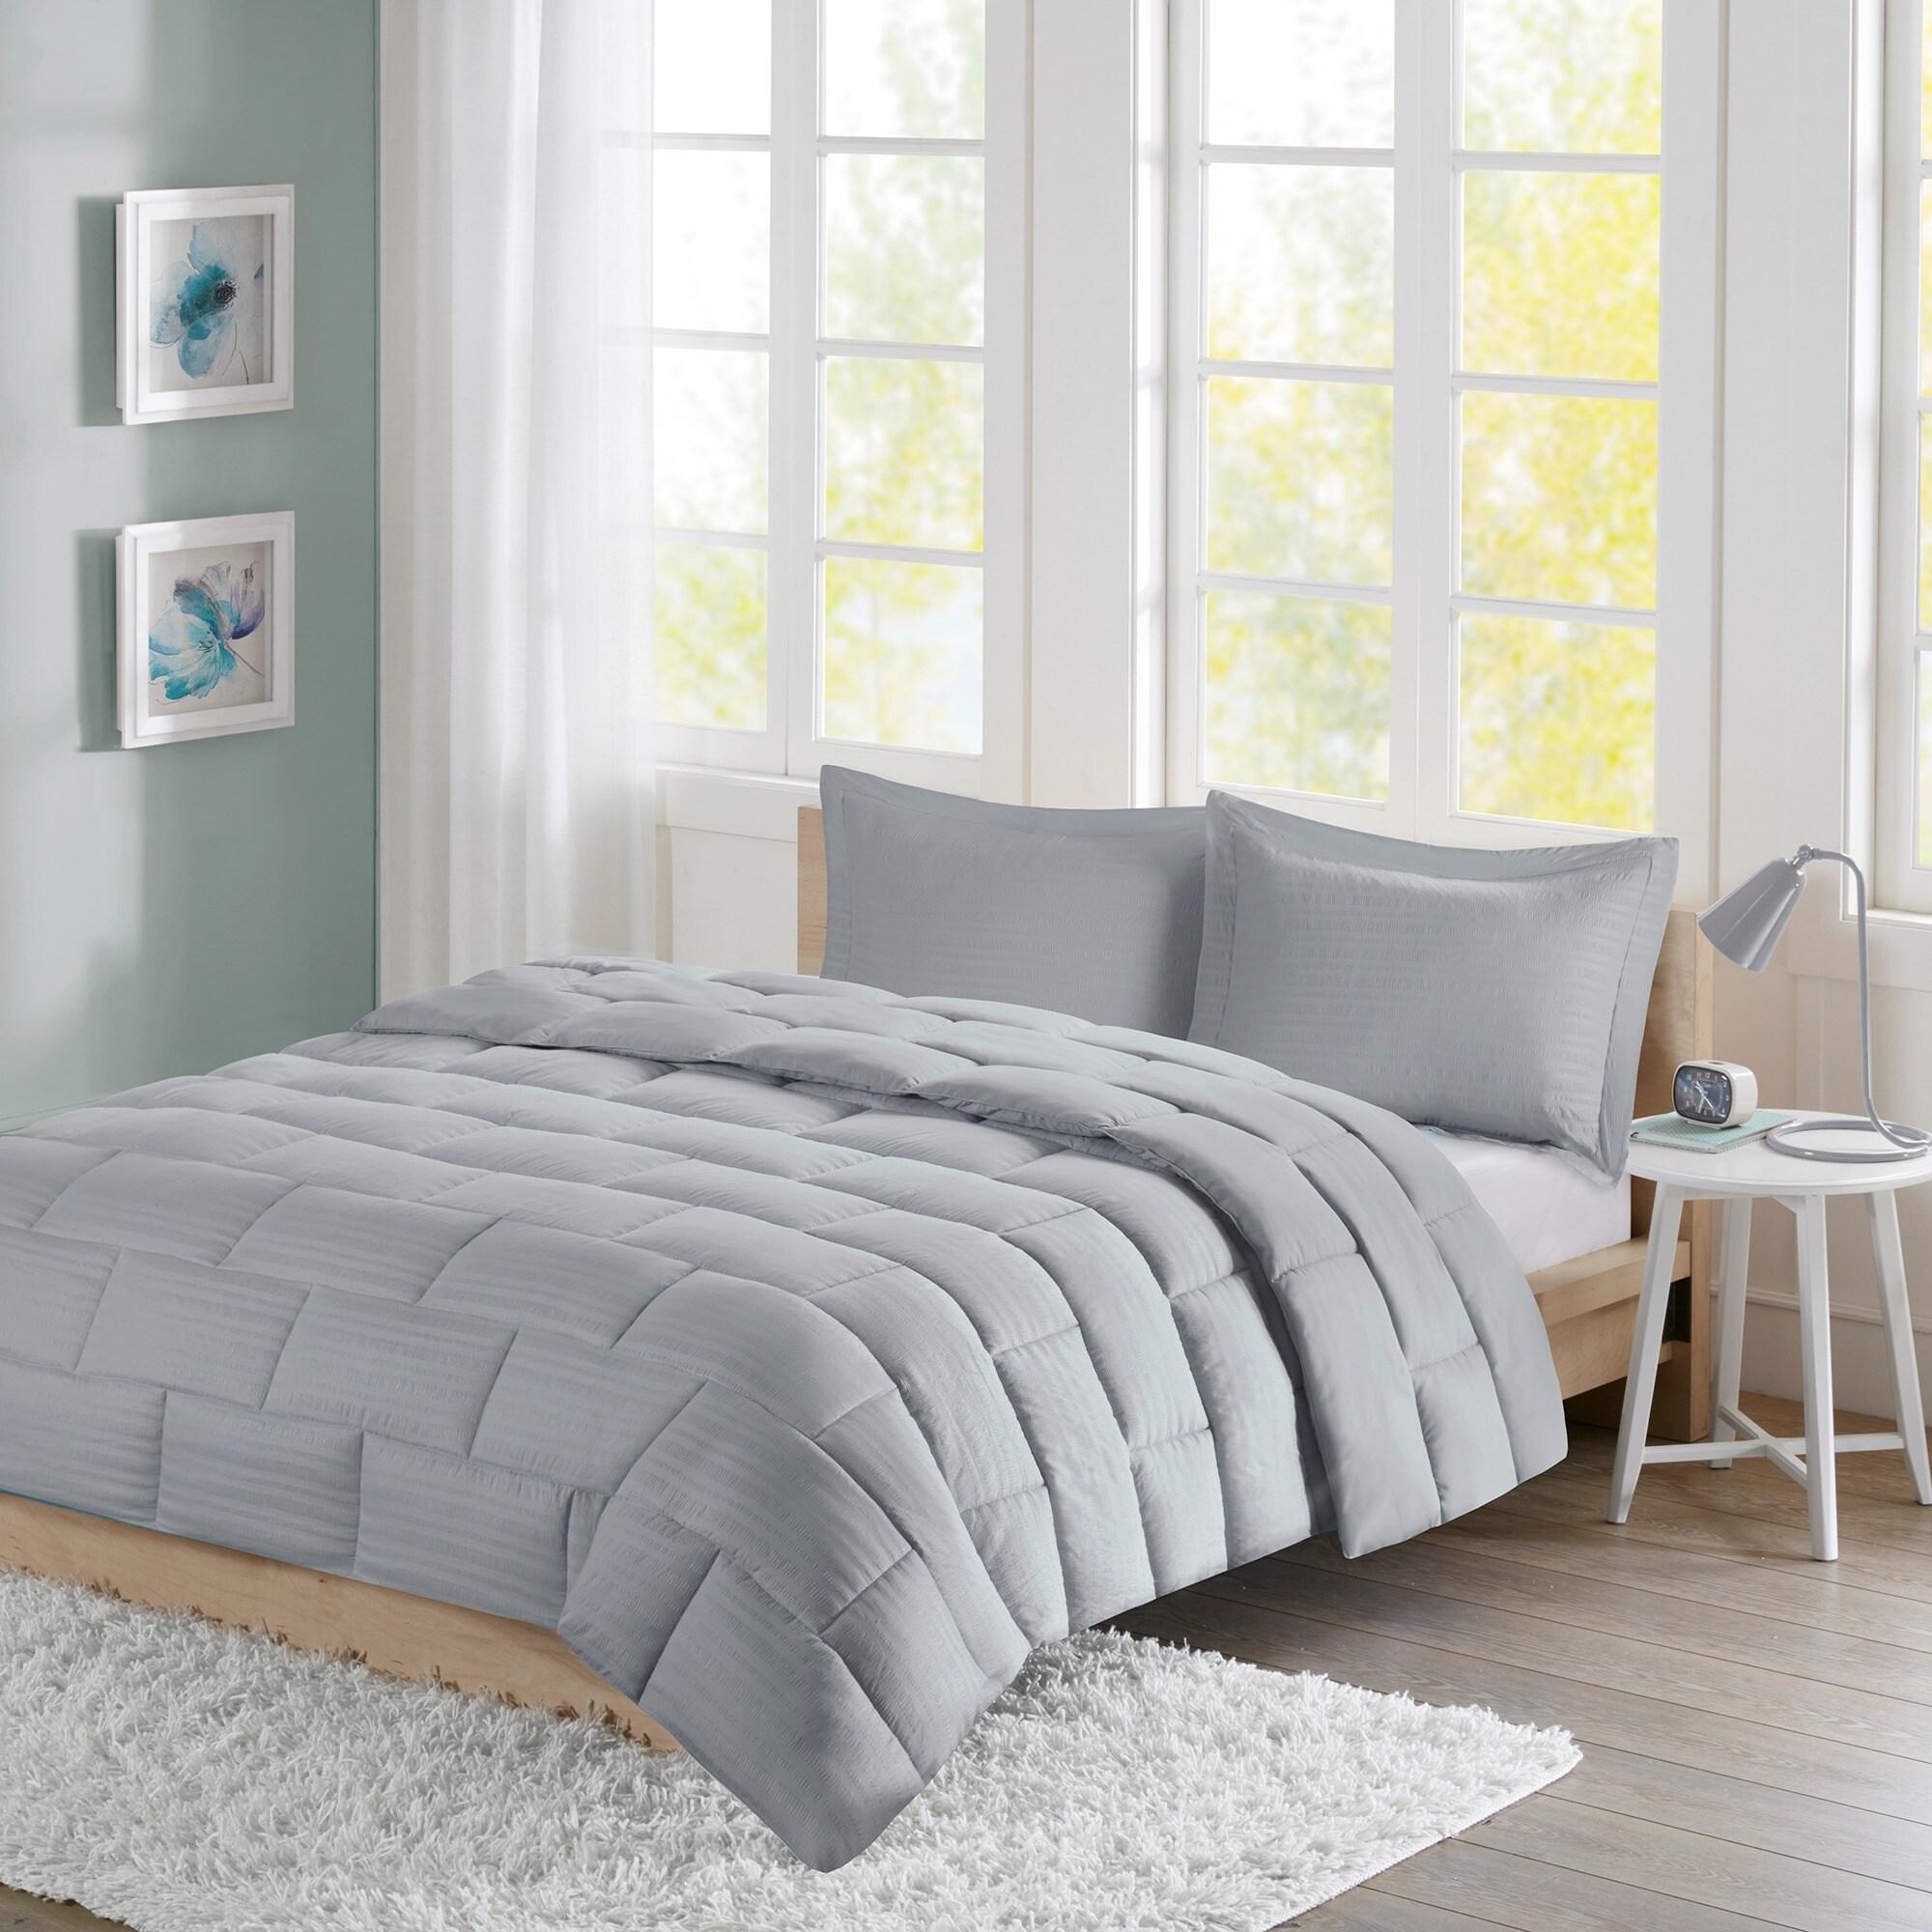 Intelligent Design Ava Seersucker Down Alternative Mini Comforter ...